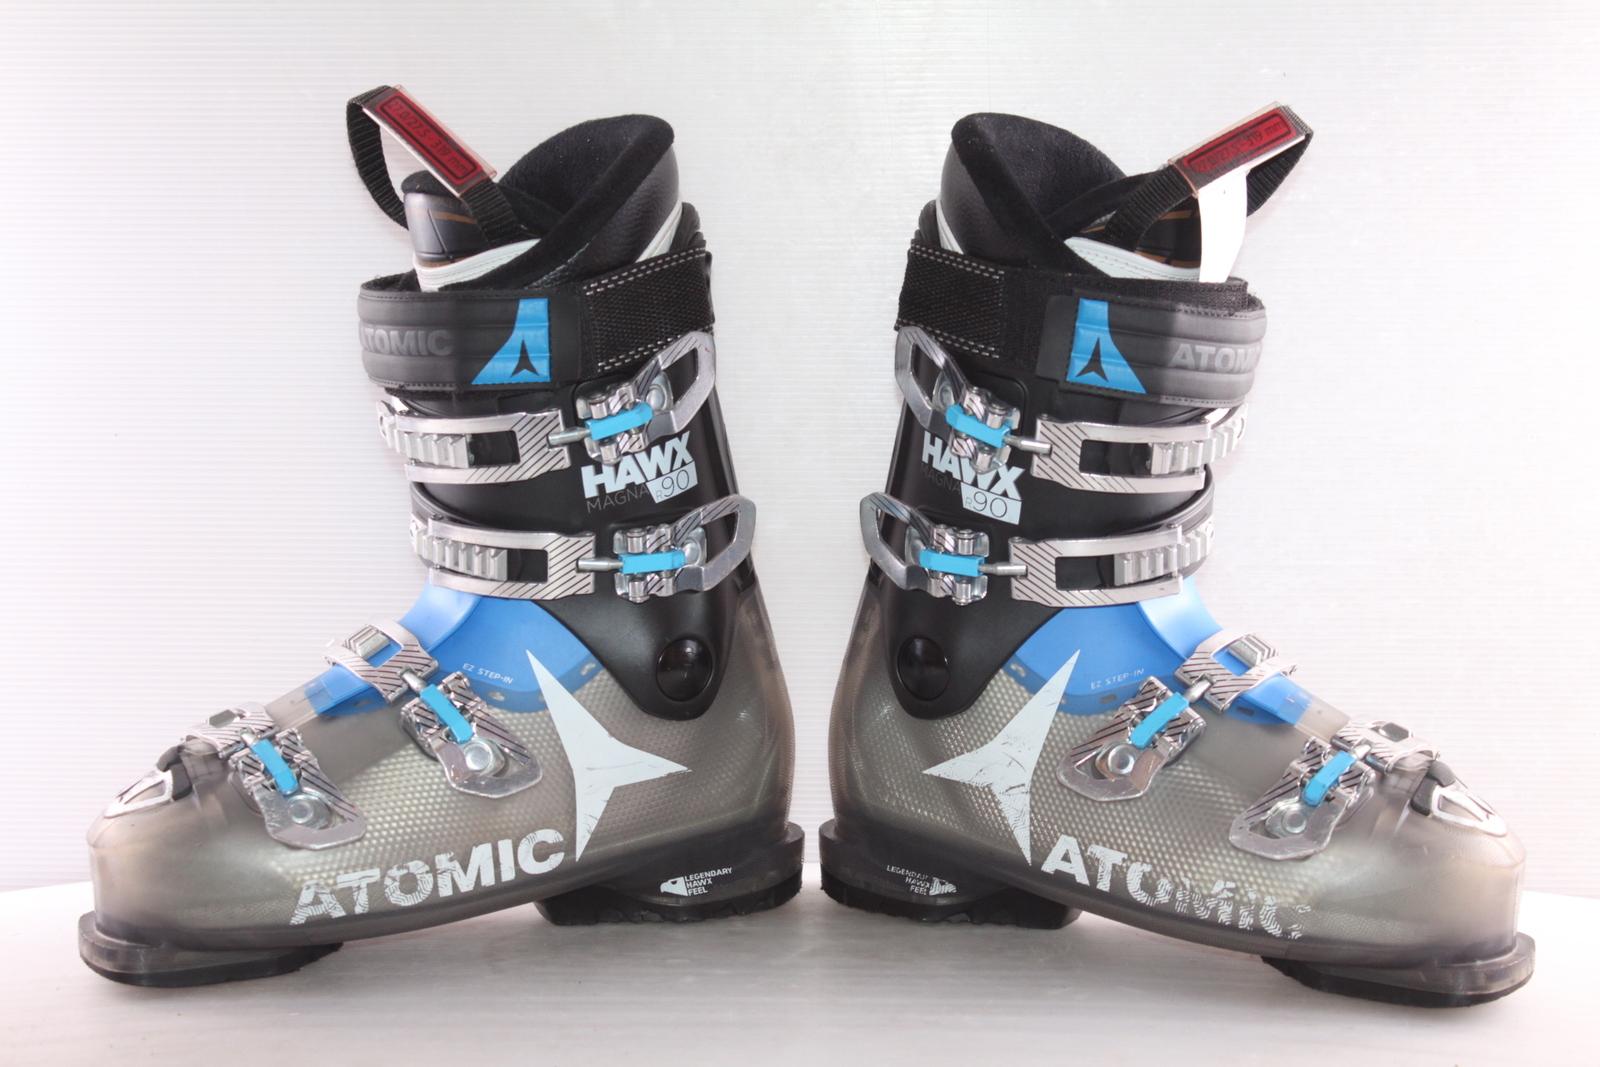 Lyžařské boty Atomic Hawx Magna R90 vel. EU42.5